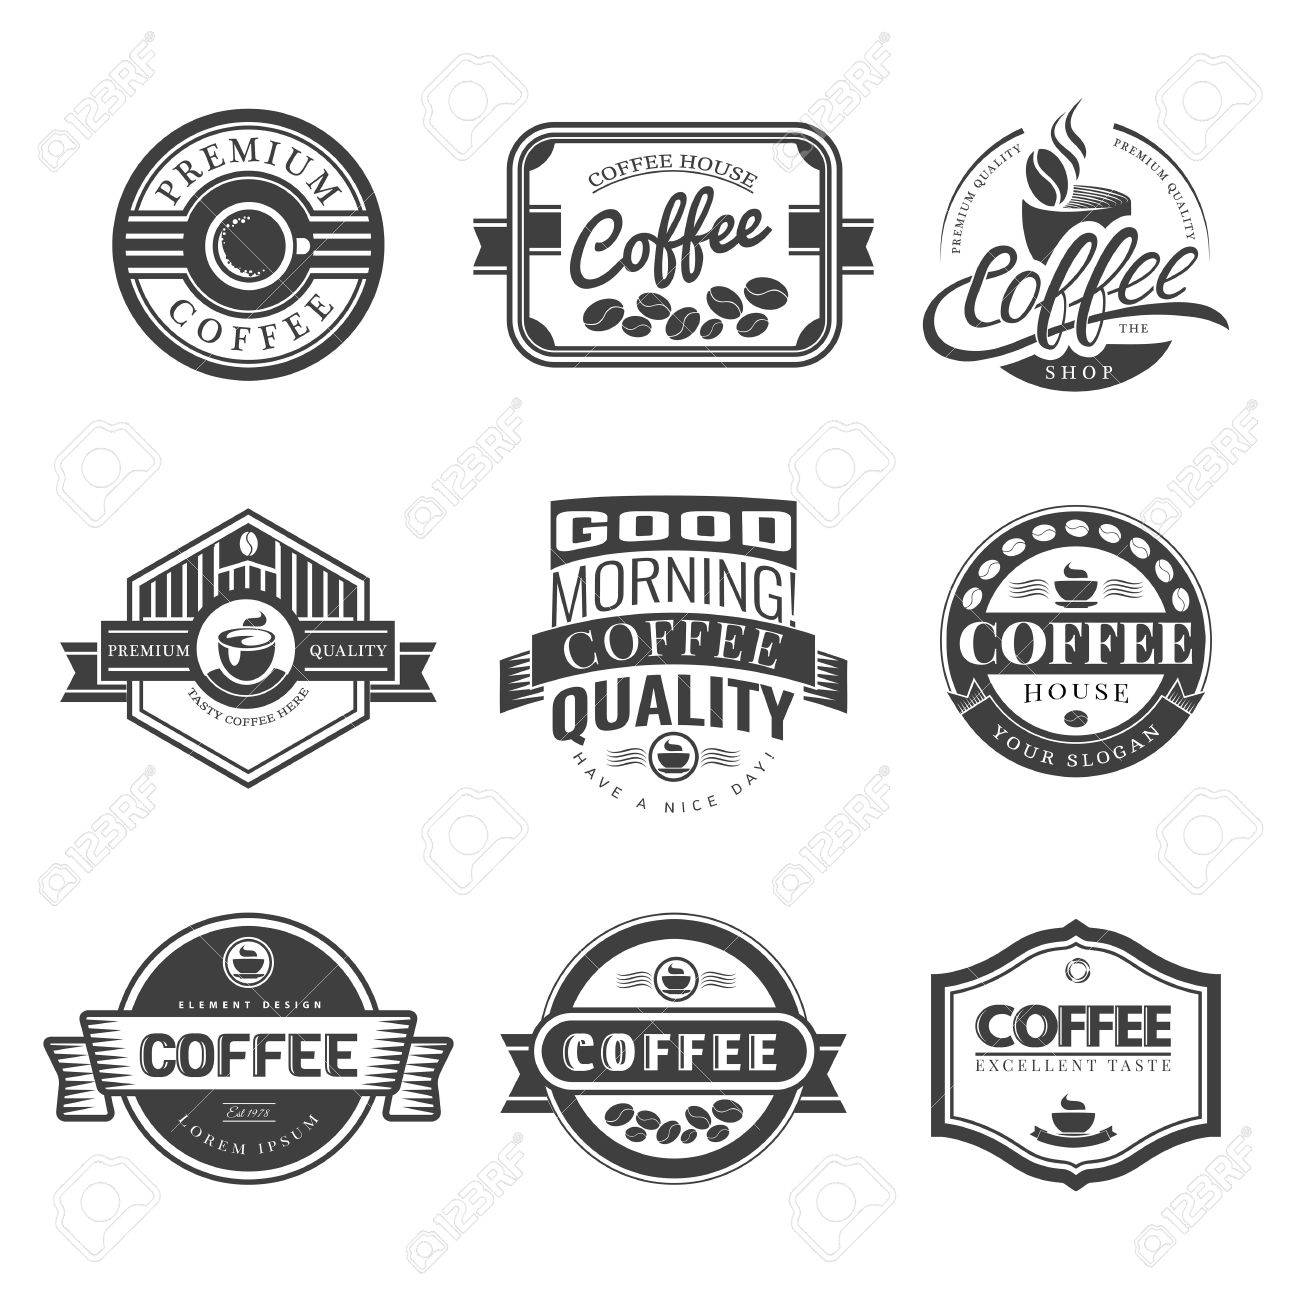 Coffee Vintage Labels Logo Template Collection. Vector Symbols and Icons of Retro style. Mocha, Espresso, Ristretto, Latte, Americano. - 44886906